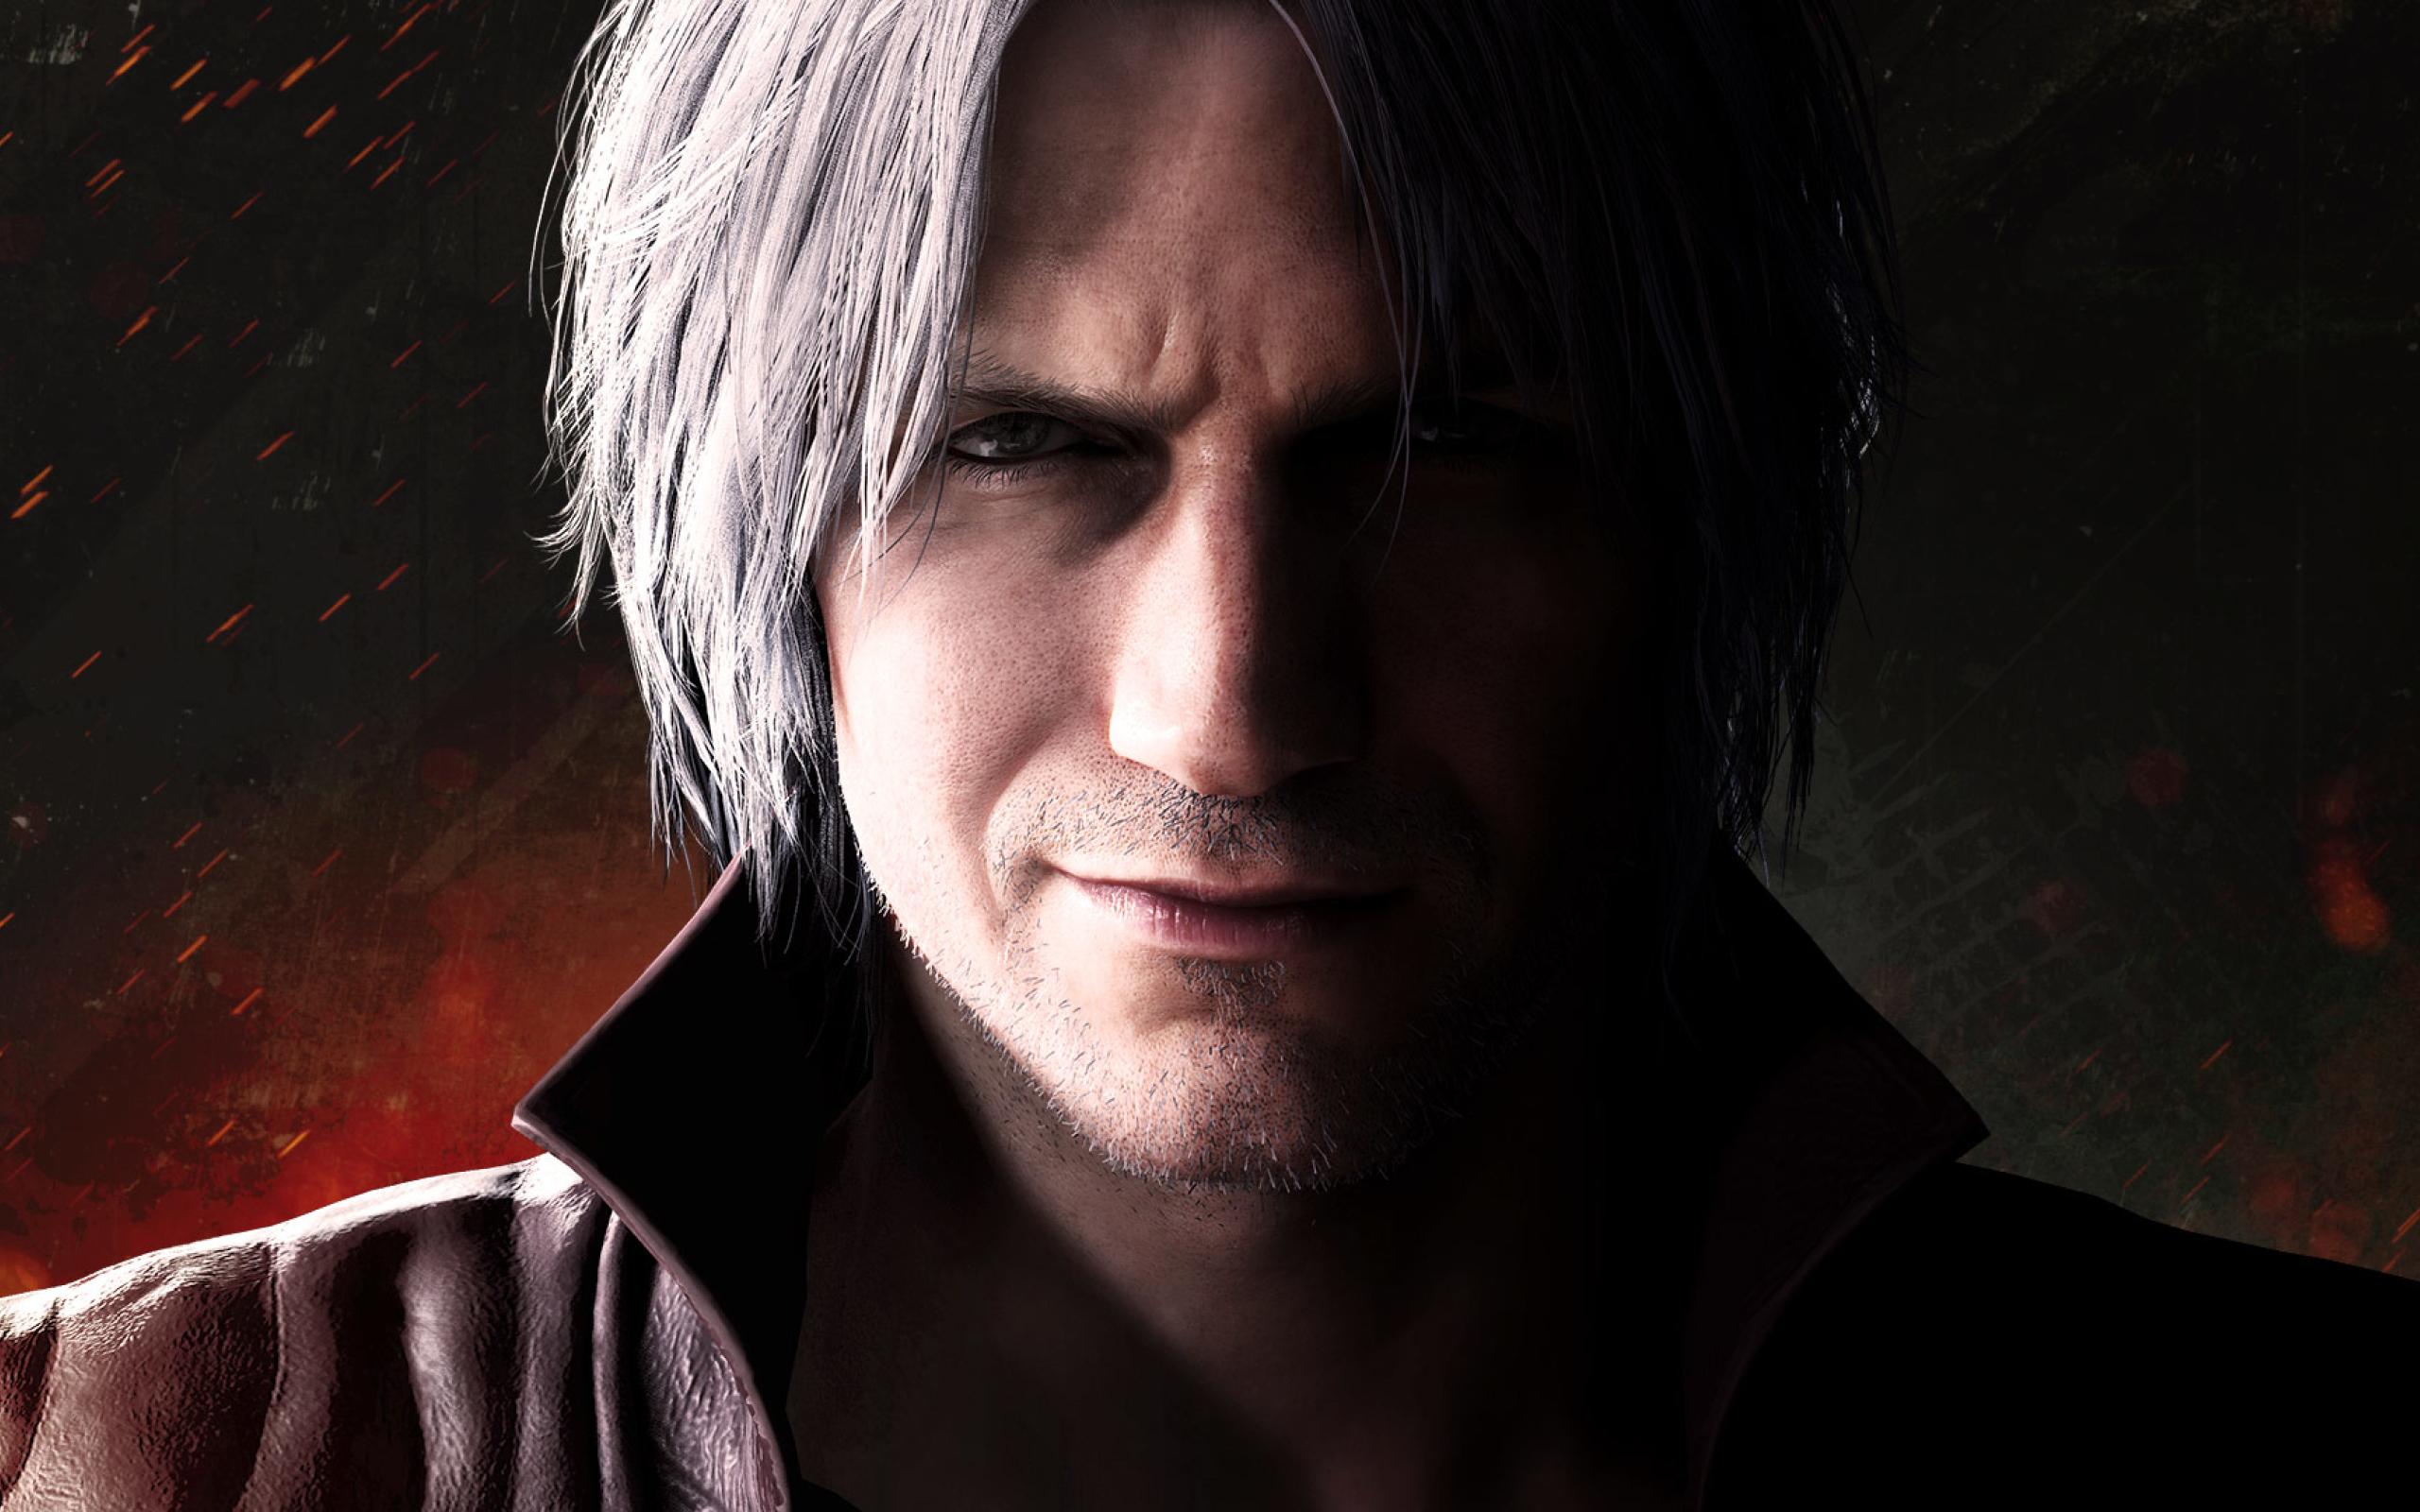 2560x1600 Dante Devil May Cry 5 2560x1600 Resolution